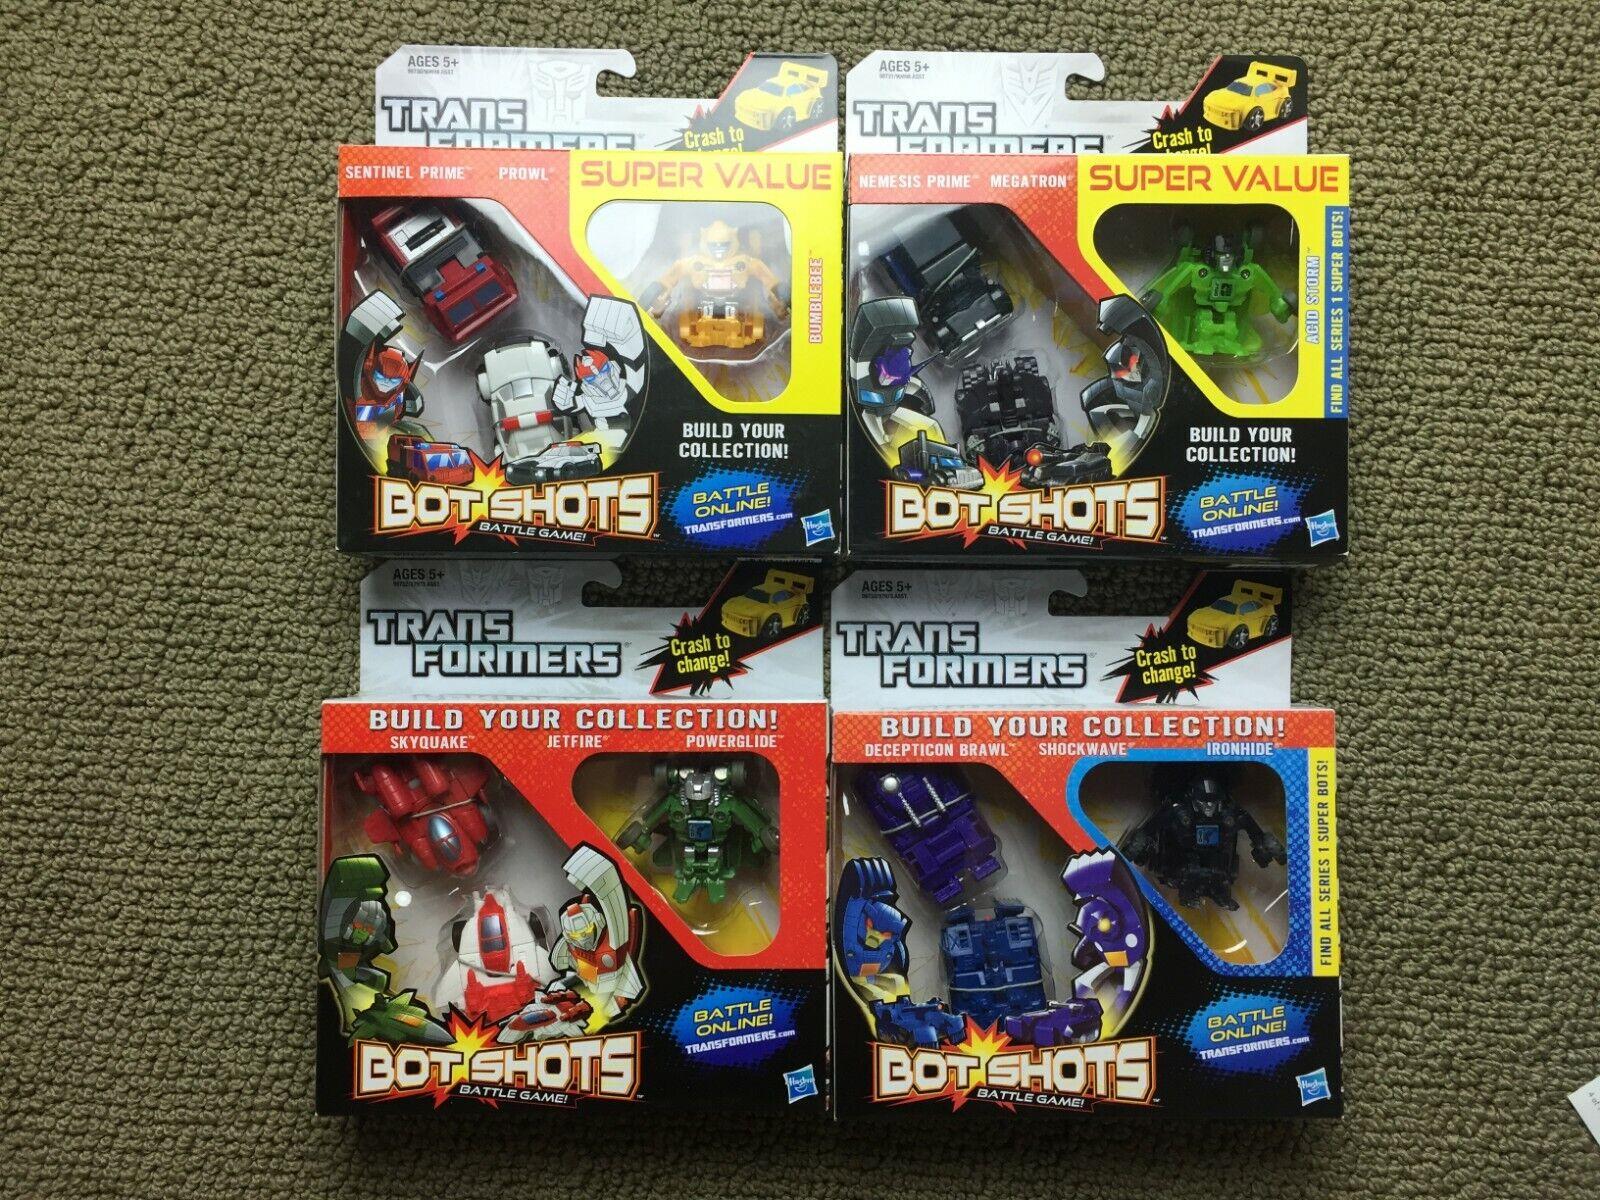 comprar descuentos Transformers Transformers Transformers Bot Tiros serie 1 Bumblebee Sentinel Prime prwol Jetfire Megatron  Sin impuestos